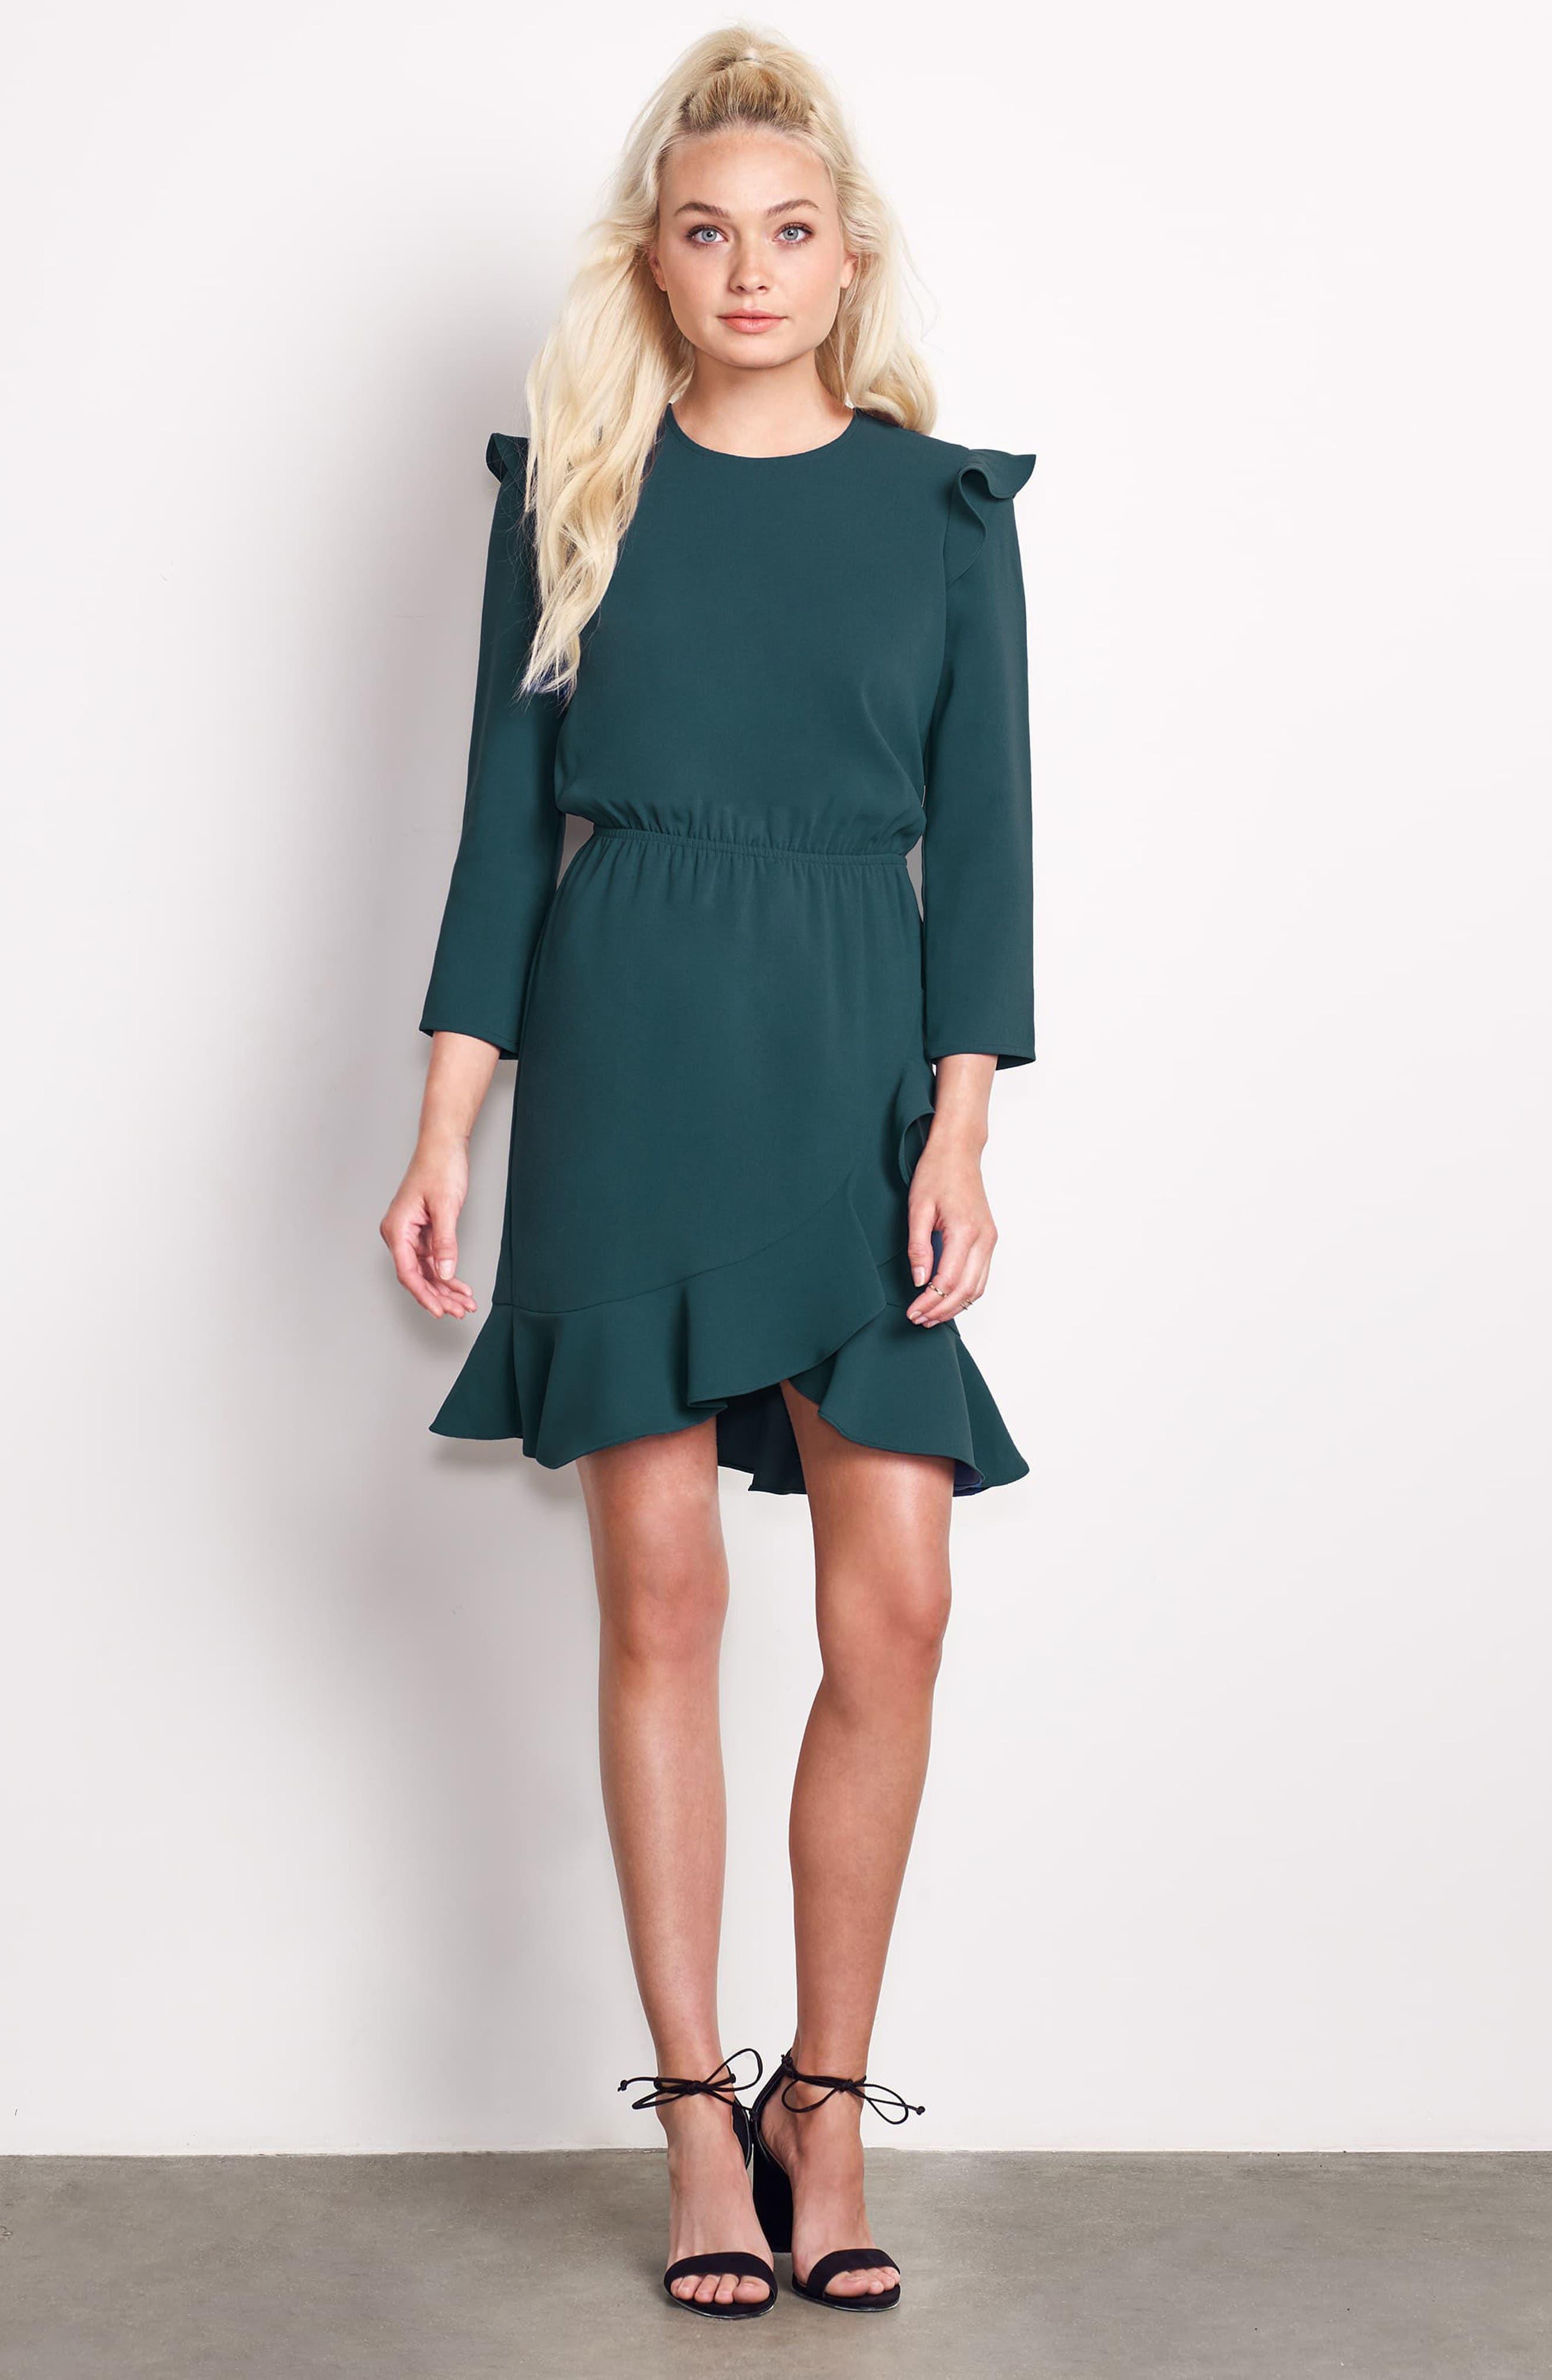 St Germain Ruffle Fit & Flare Dress,                             Alternate thumbnail 14, color,